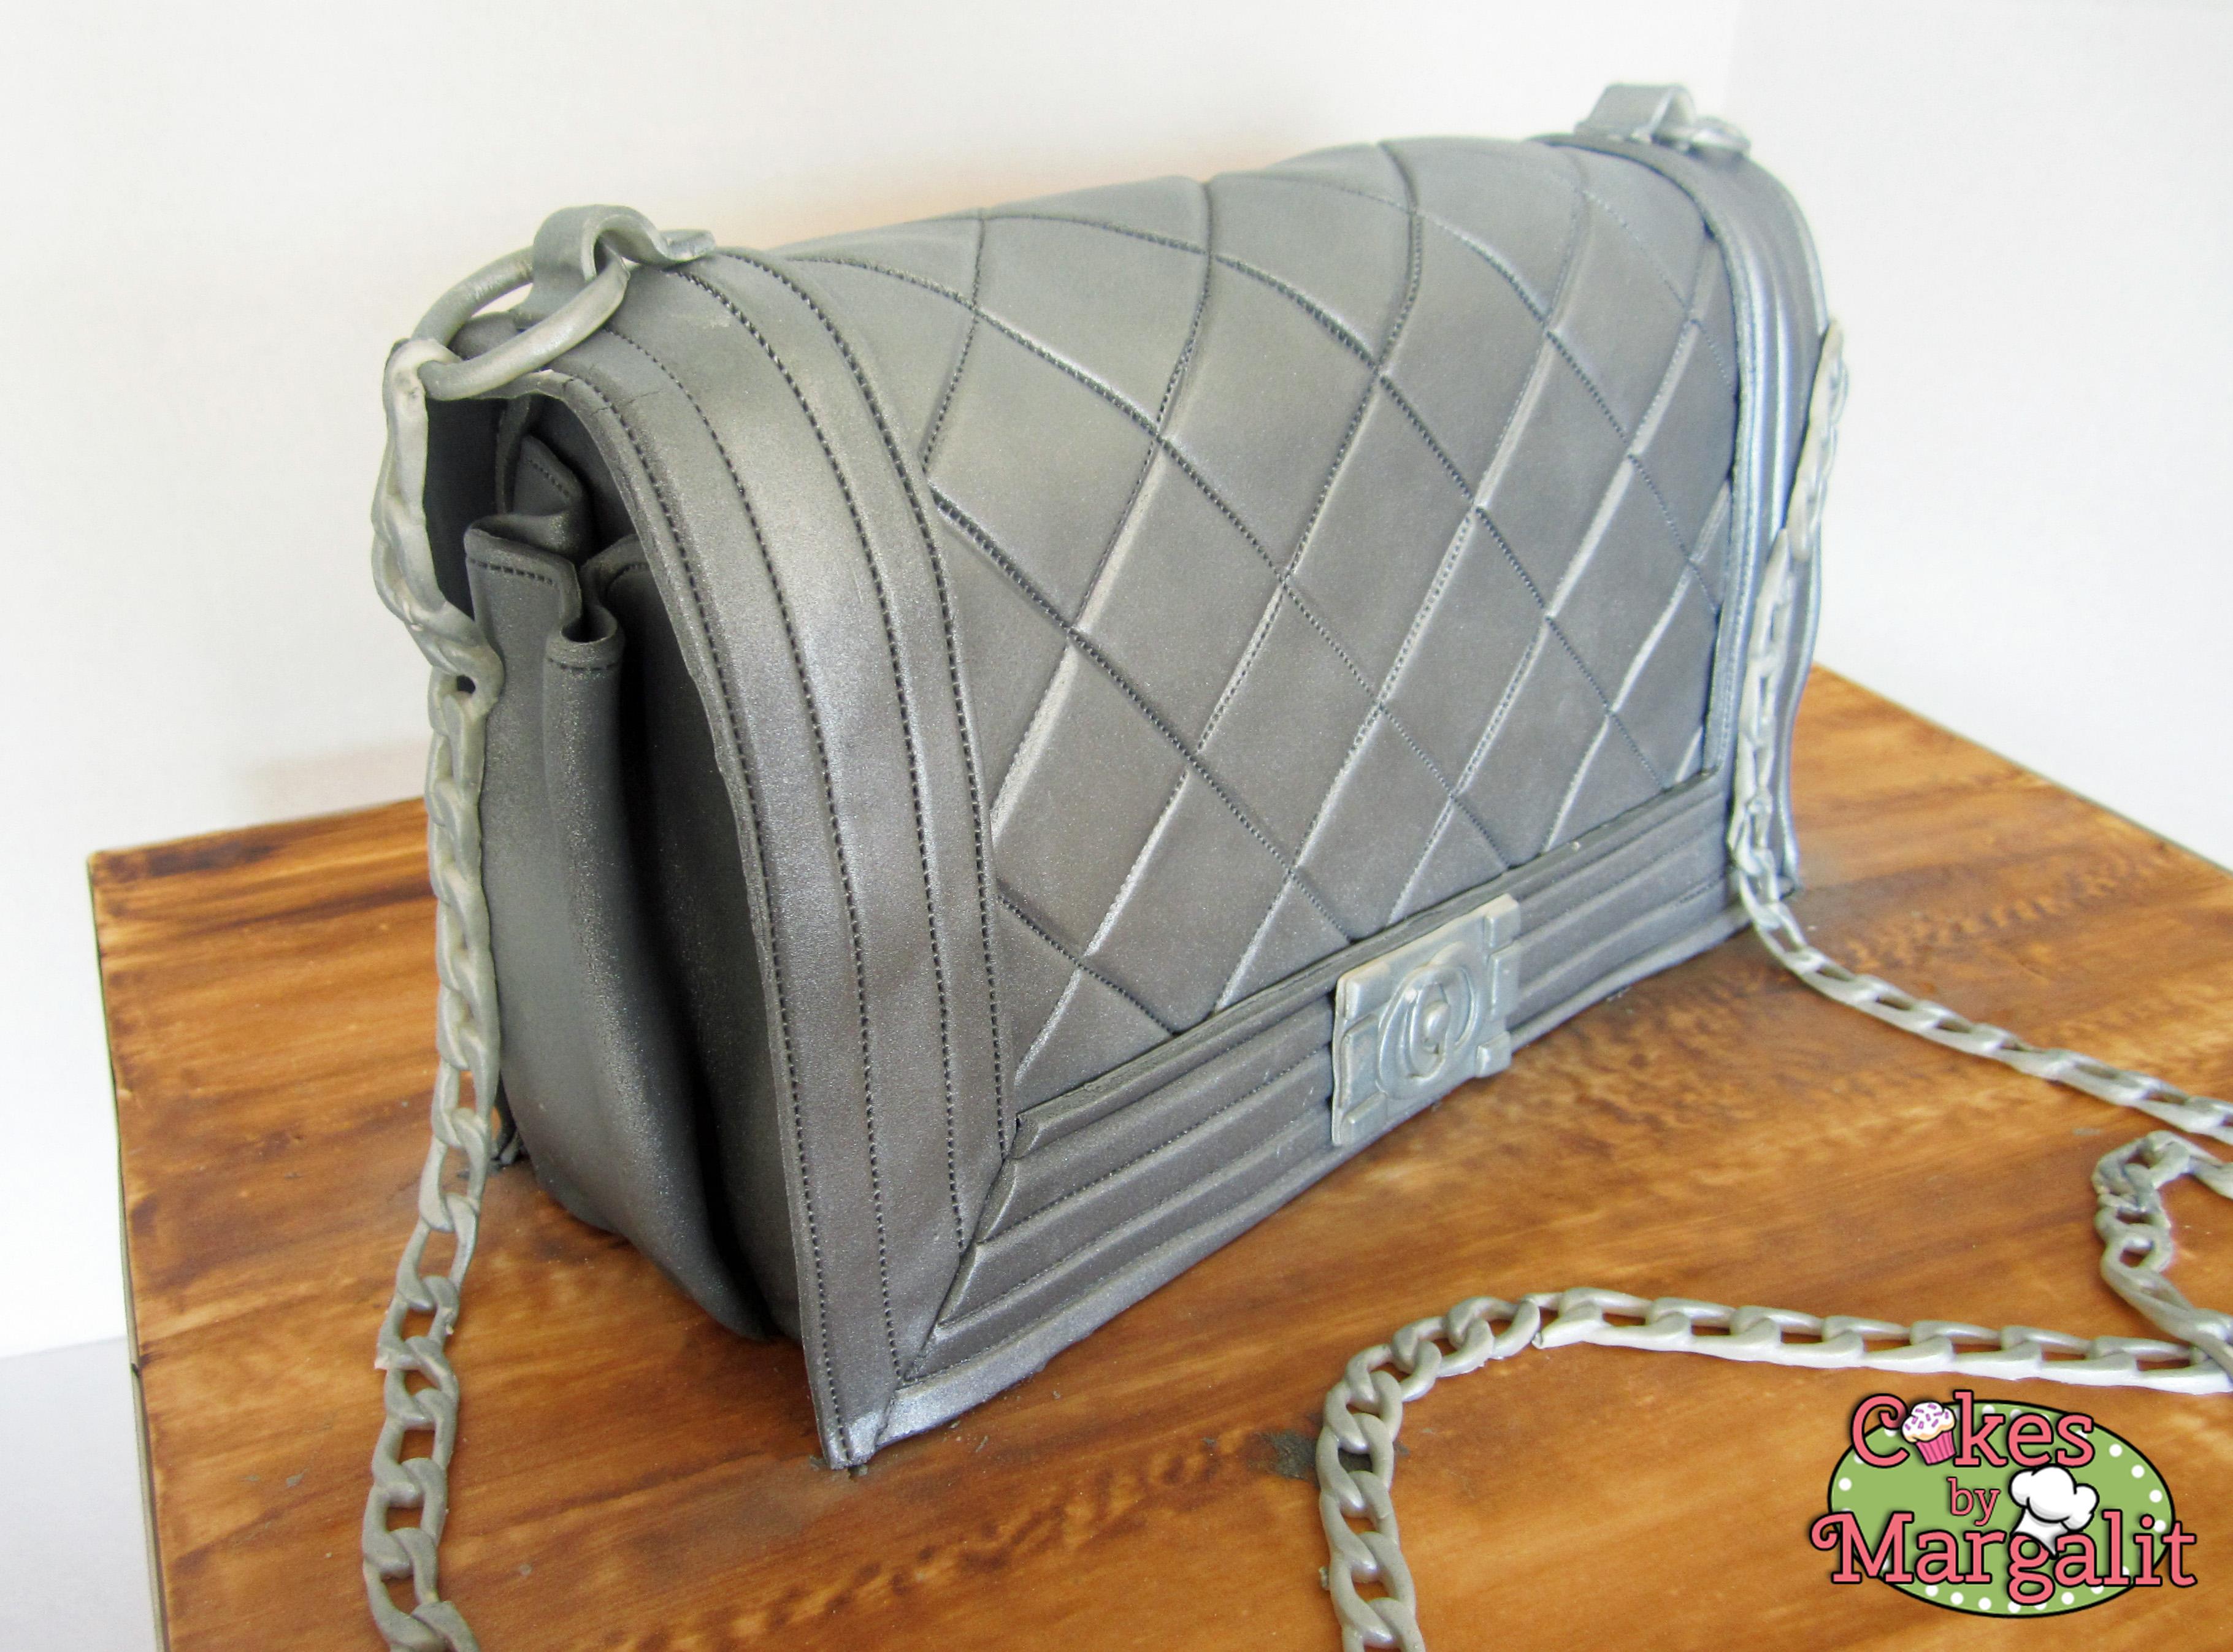 Silver Chanel Handbag Cake 20170124 175346